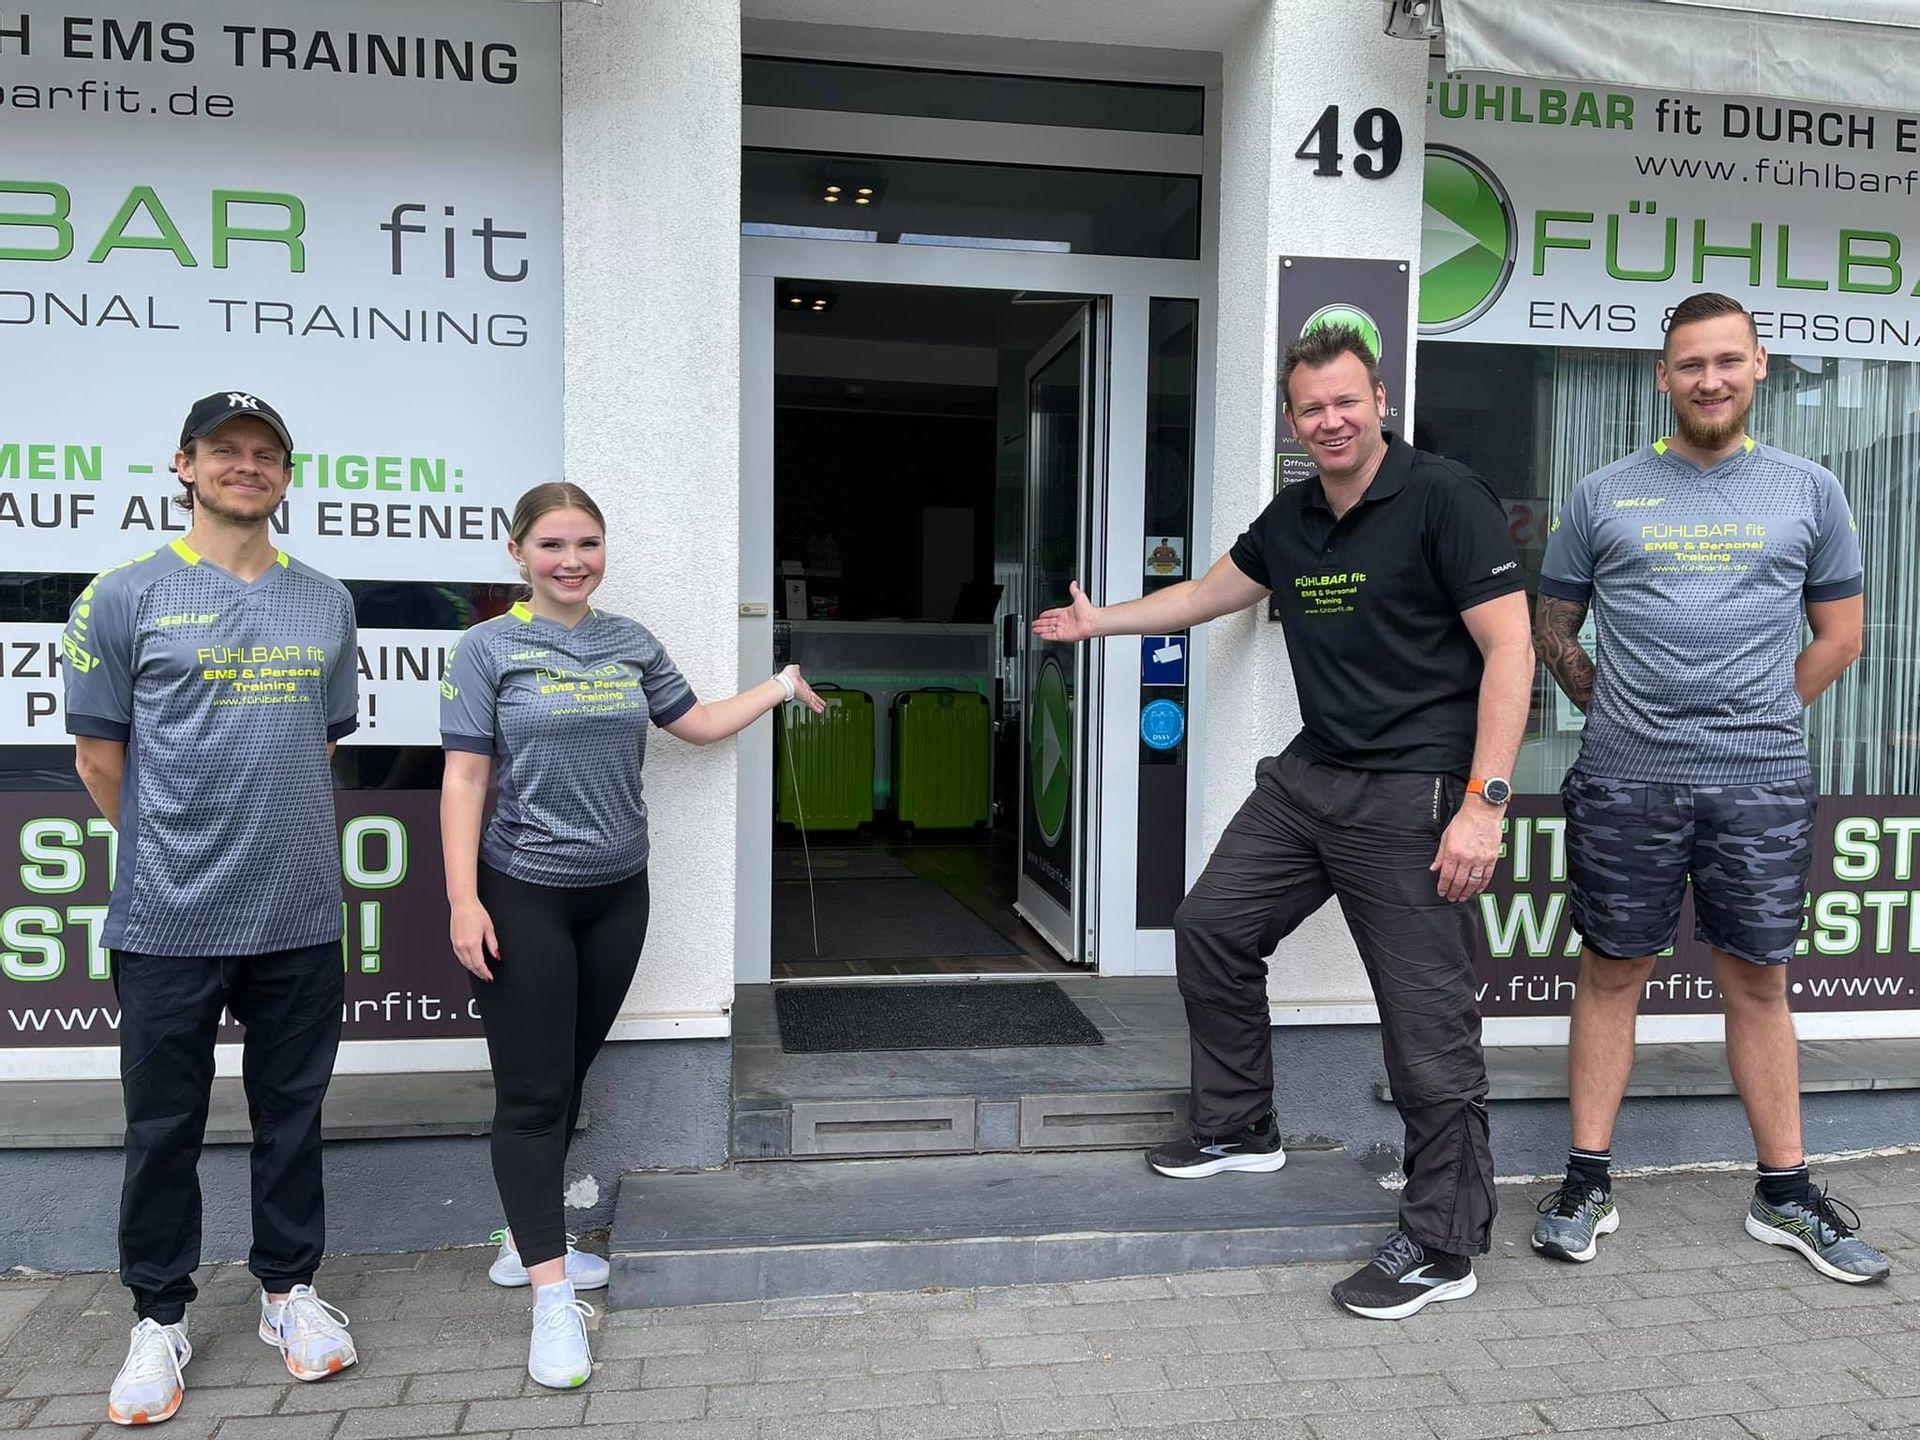 Aktuell | FÃœHLBAR fit - DAS GESUNDHEITSSTUDIO